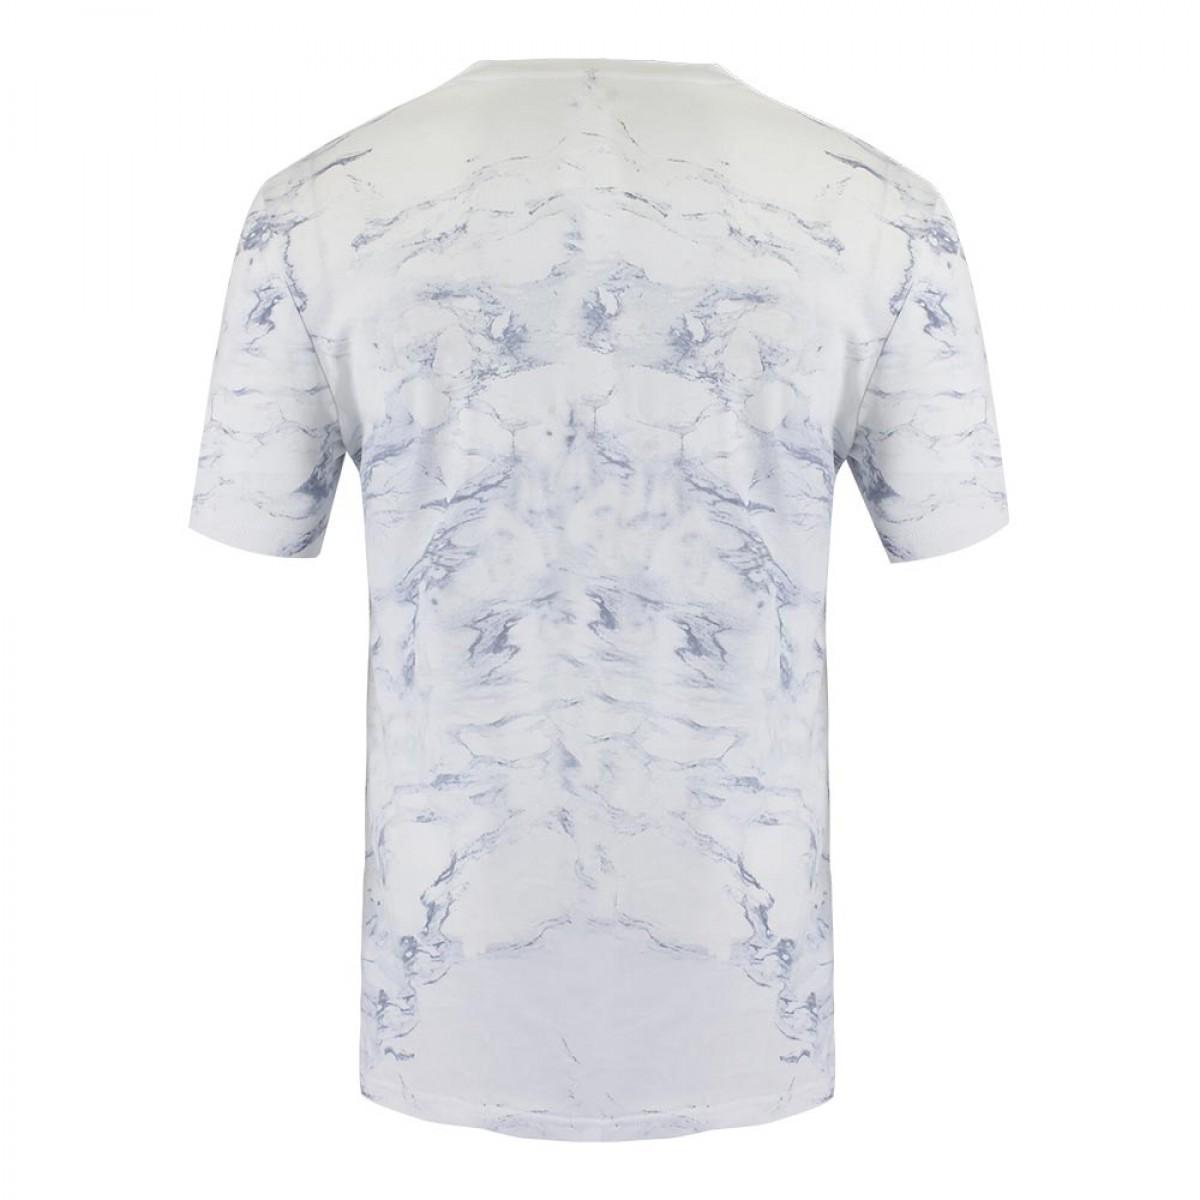 men-knitted-round-neck-t-shirt-kkrn15152-7a